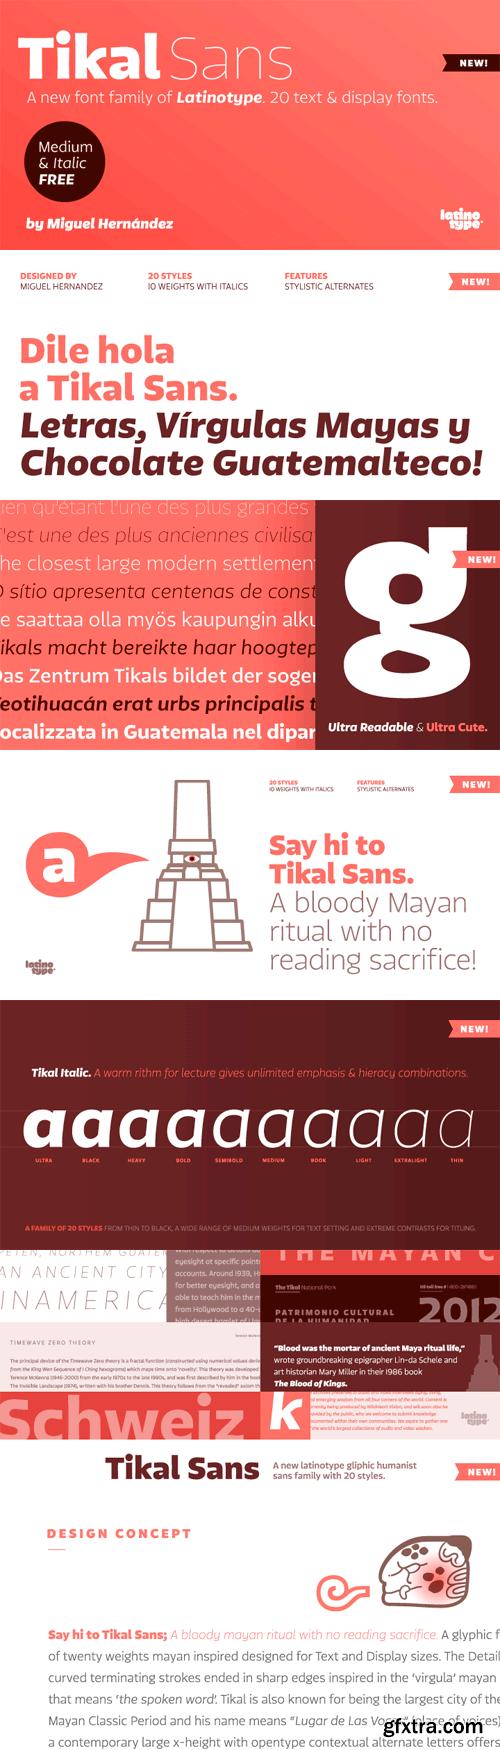 Tikal Sans Font Family - 20 Fonts for $329